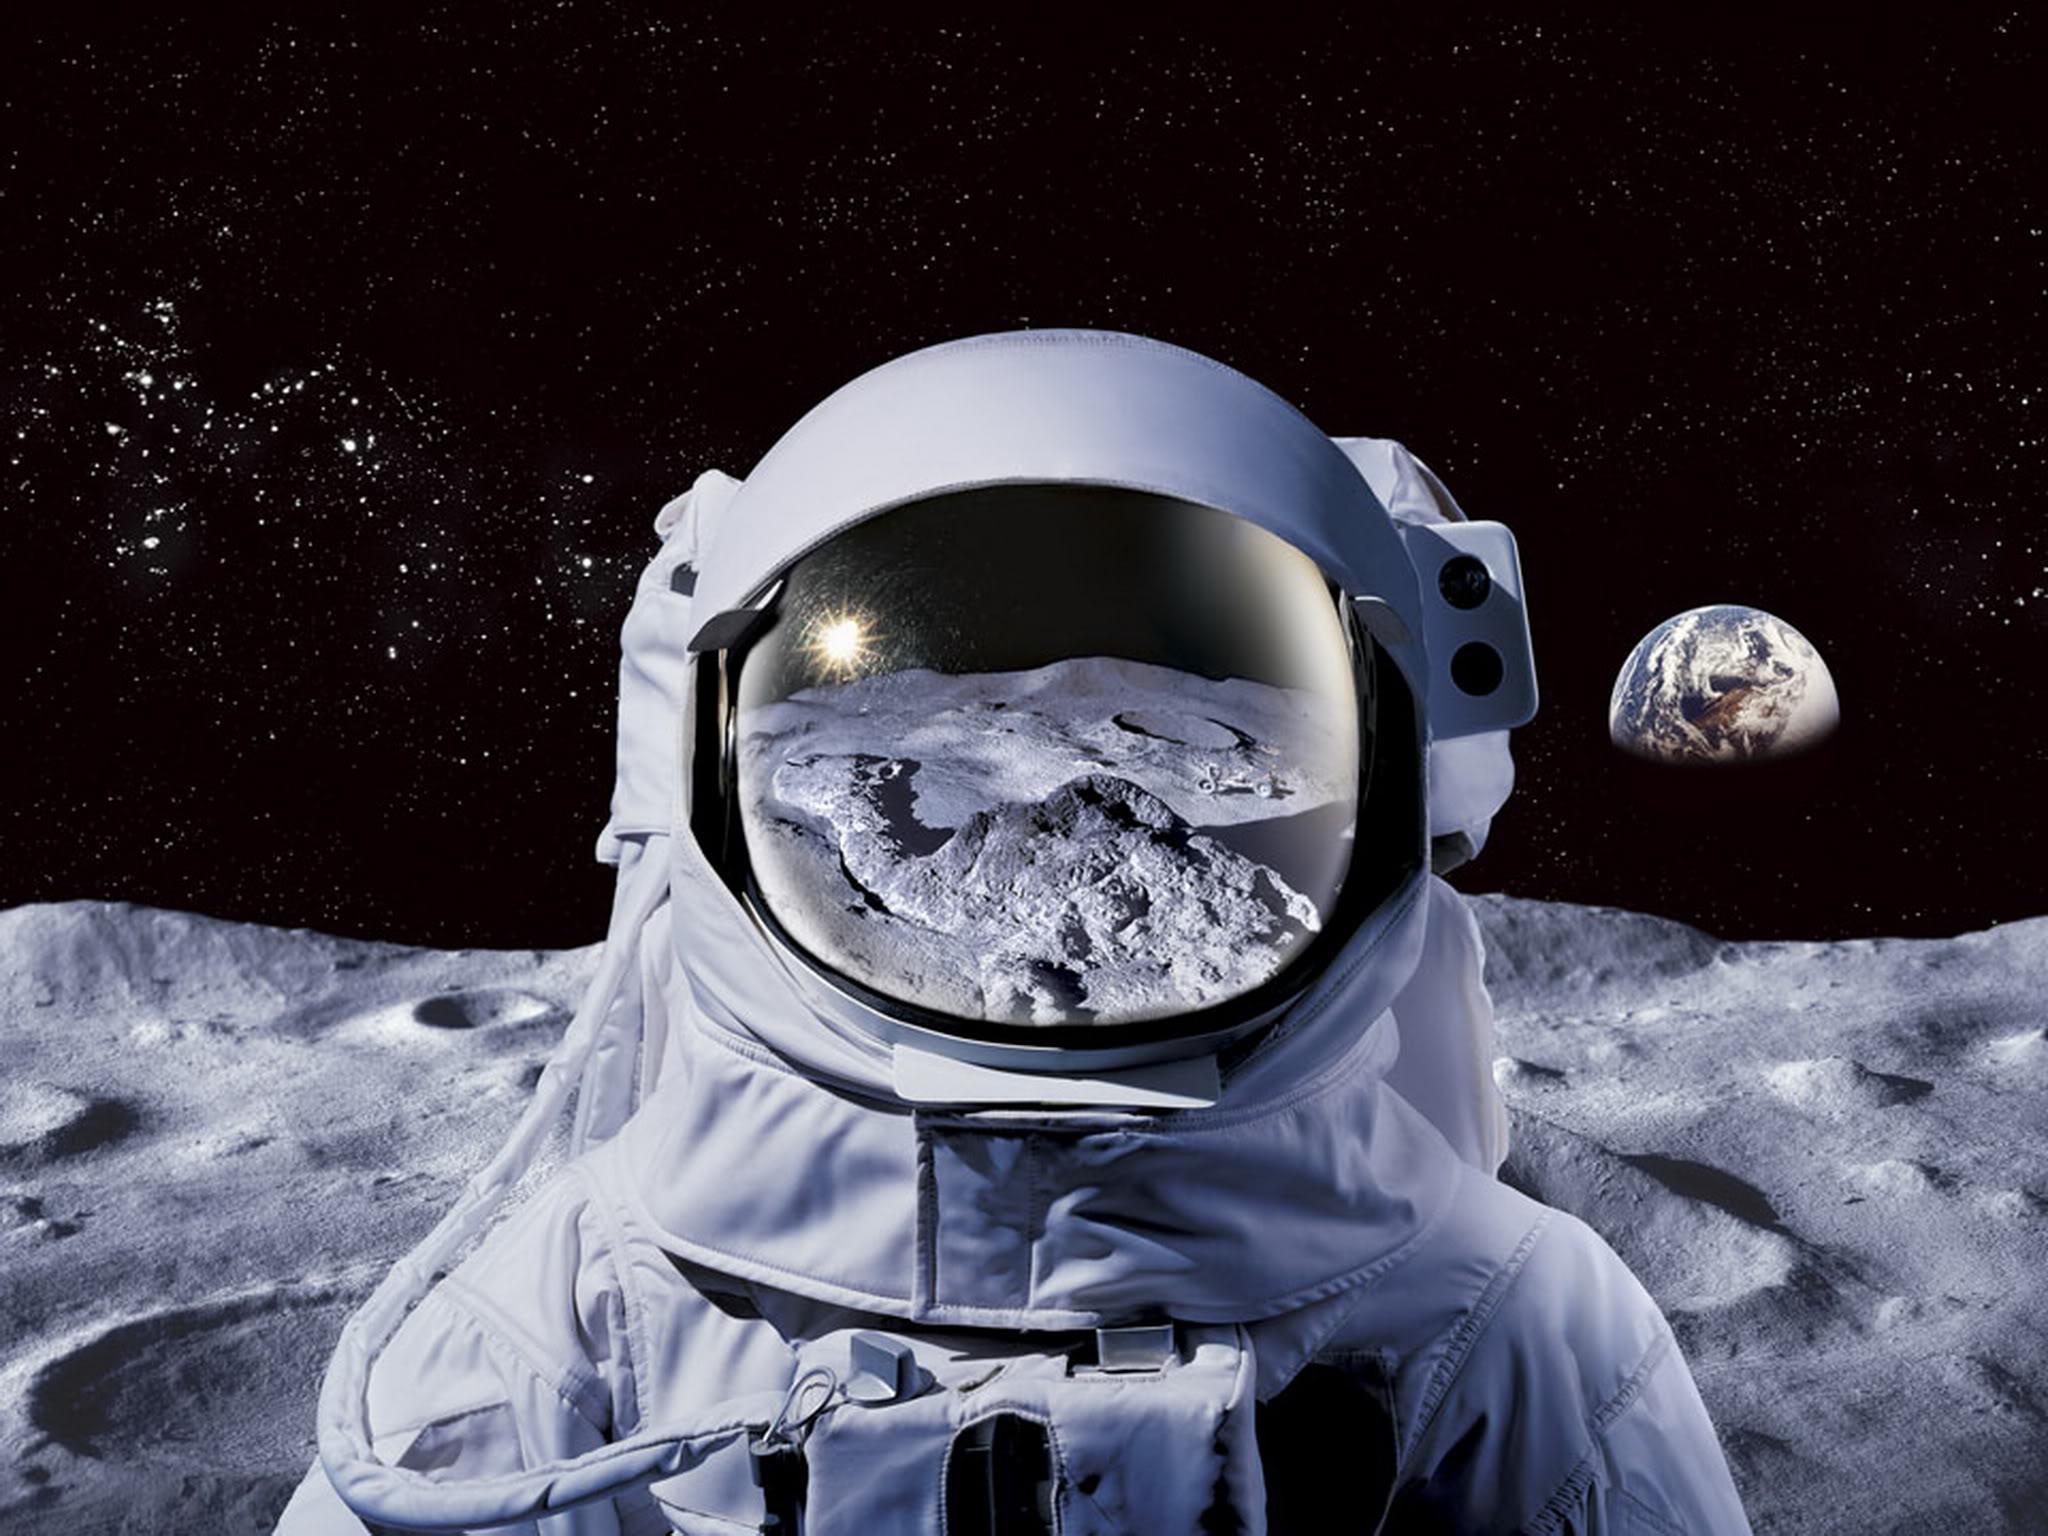 Drawn wallpaper astronaut Getting on brains wallpaper Astronauts